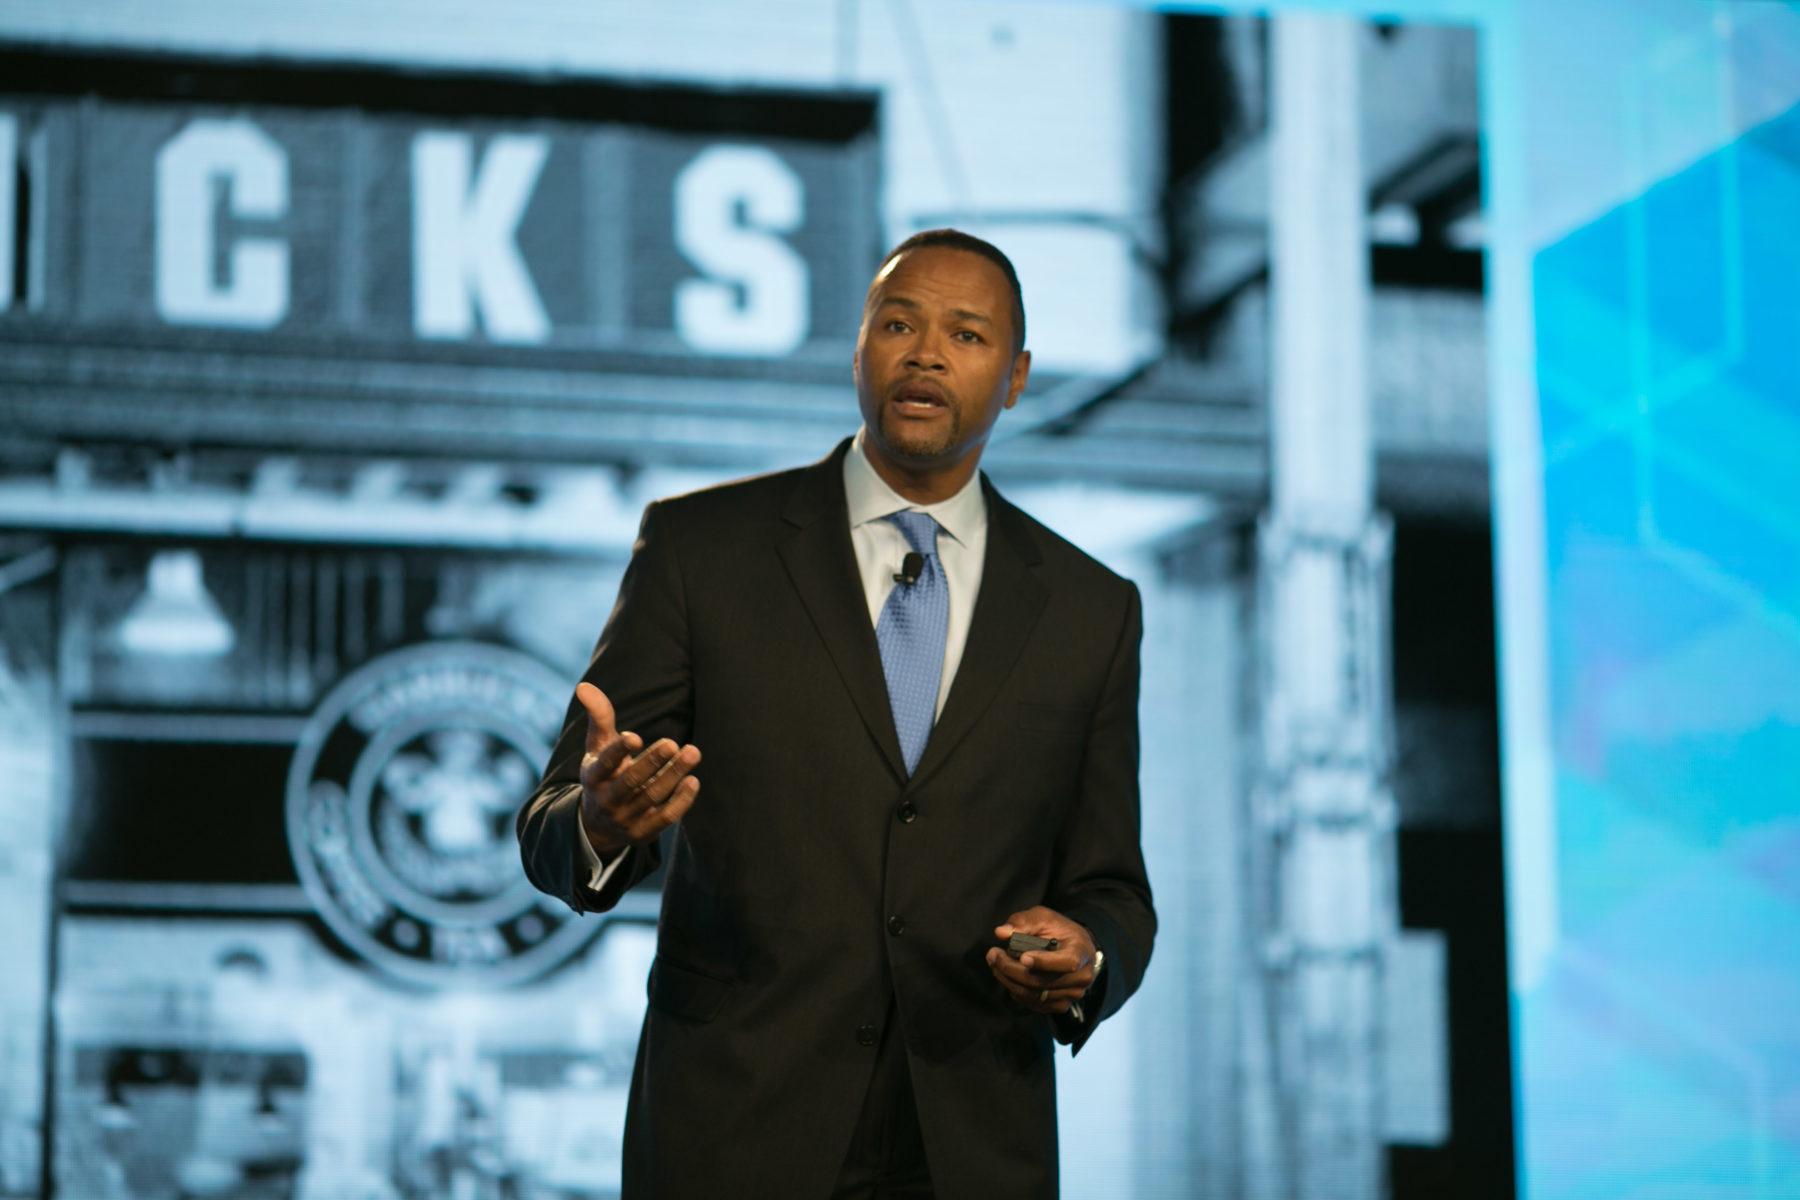 Starbuck's / PepsiCo Conferences keynote, JW Marriott Austin